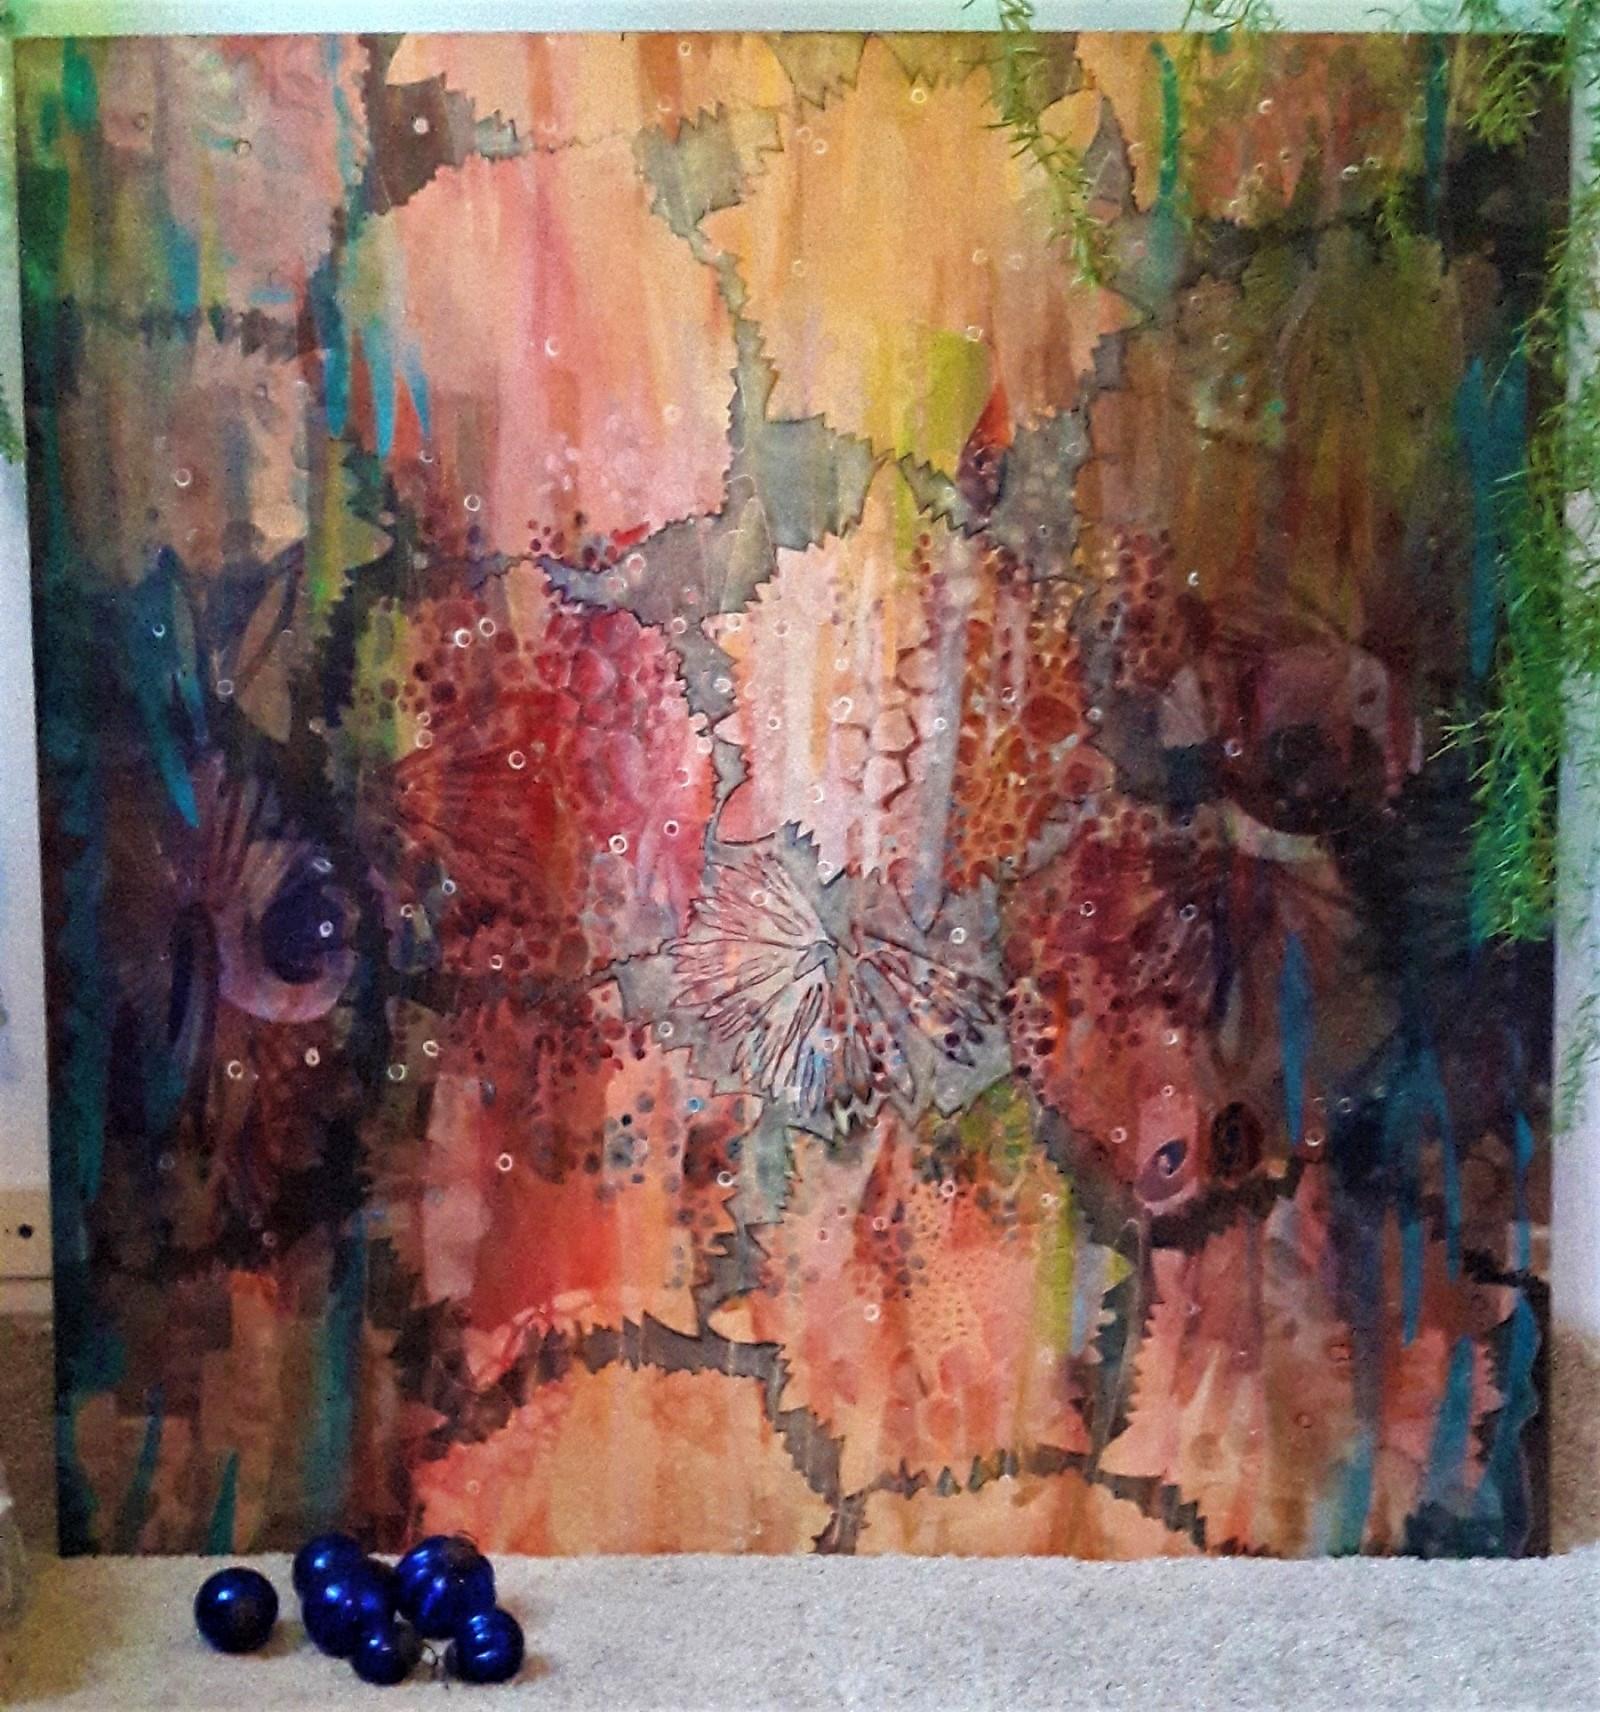 122x122 cm | Acrylic, wood | 2016 | Price 3000,- euro